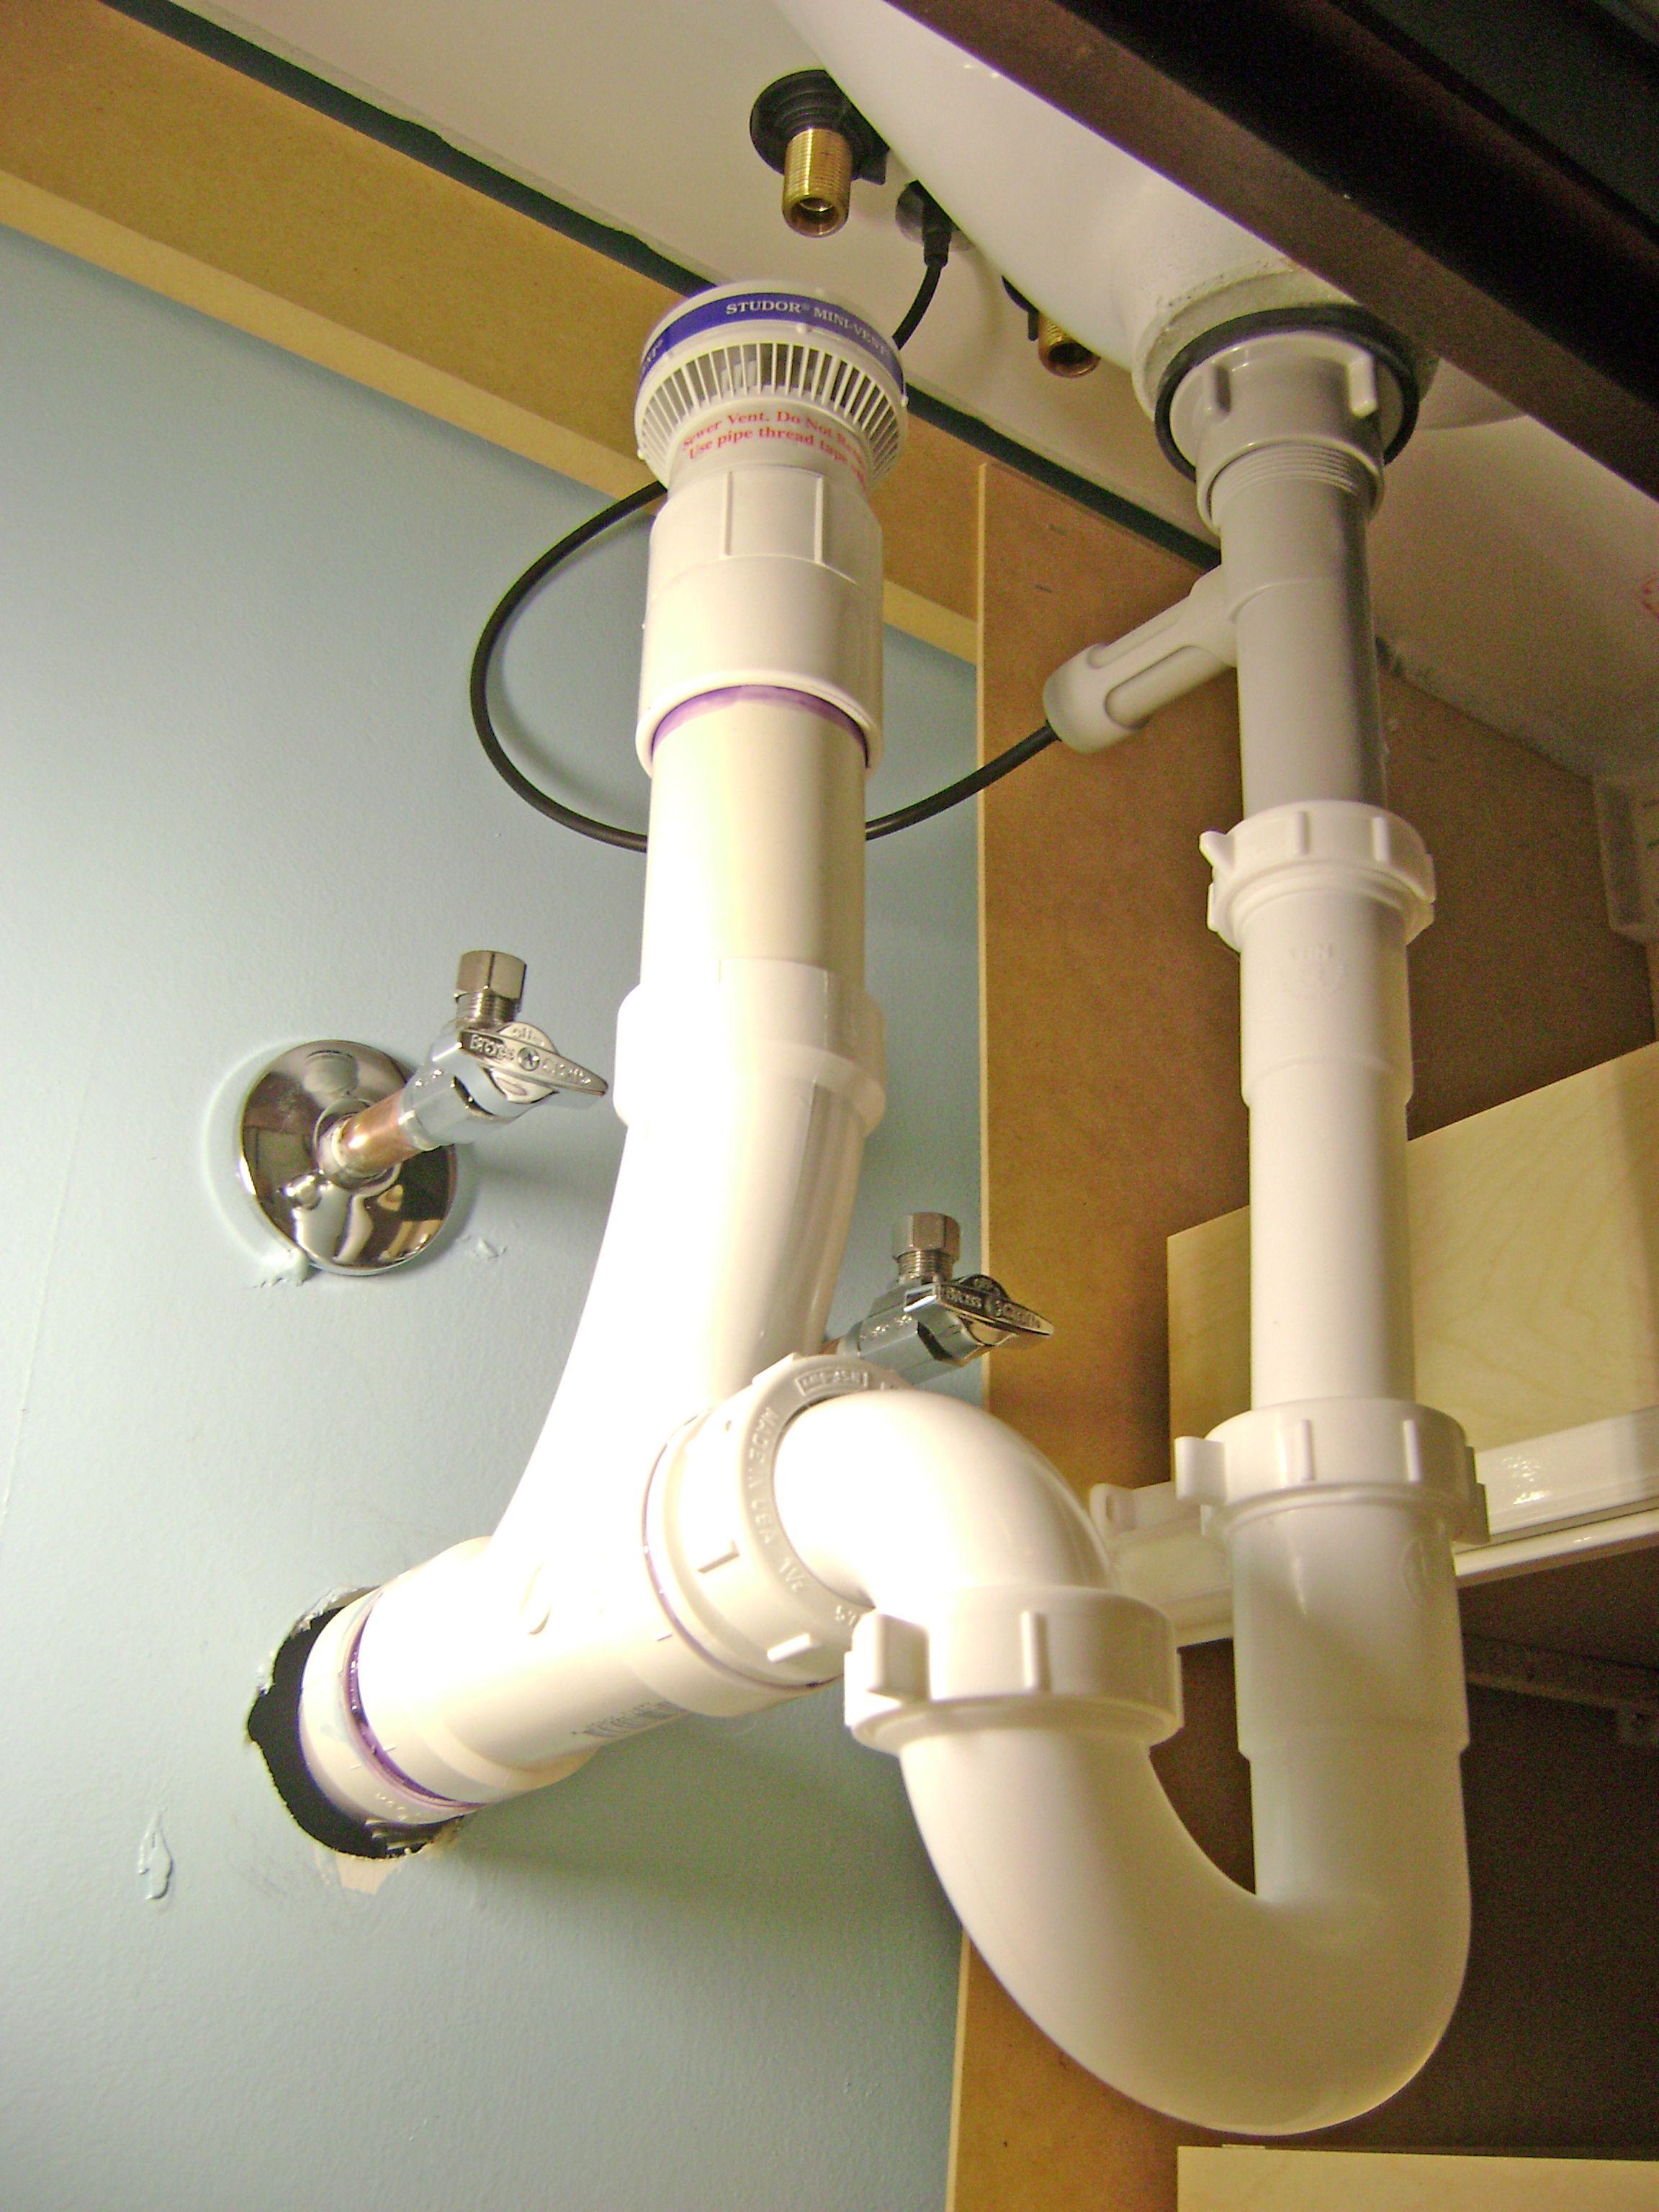 Bathroom Sink Drain Plumbing  Air Vent PTrap and PopUp